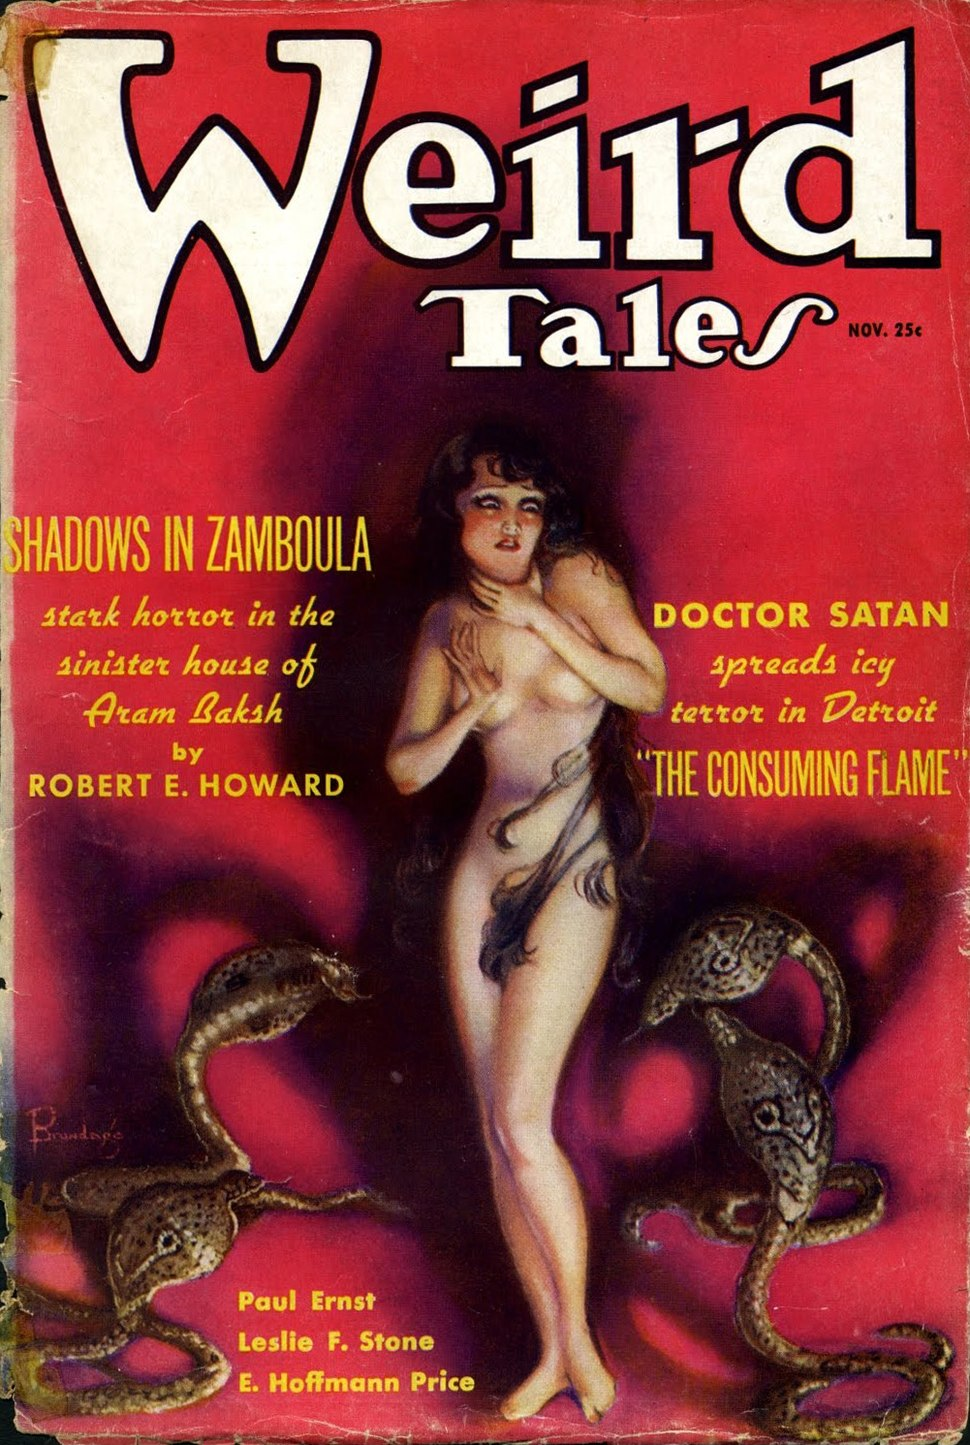 Weird Tales 1935-11 - Shadows in Zamboula